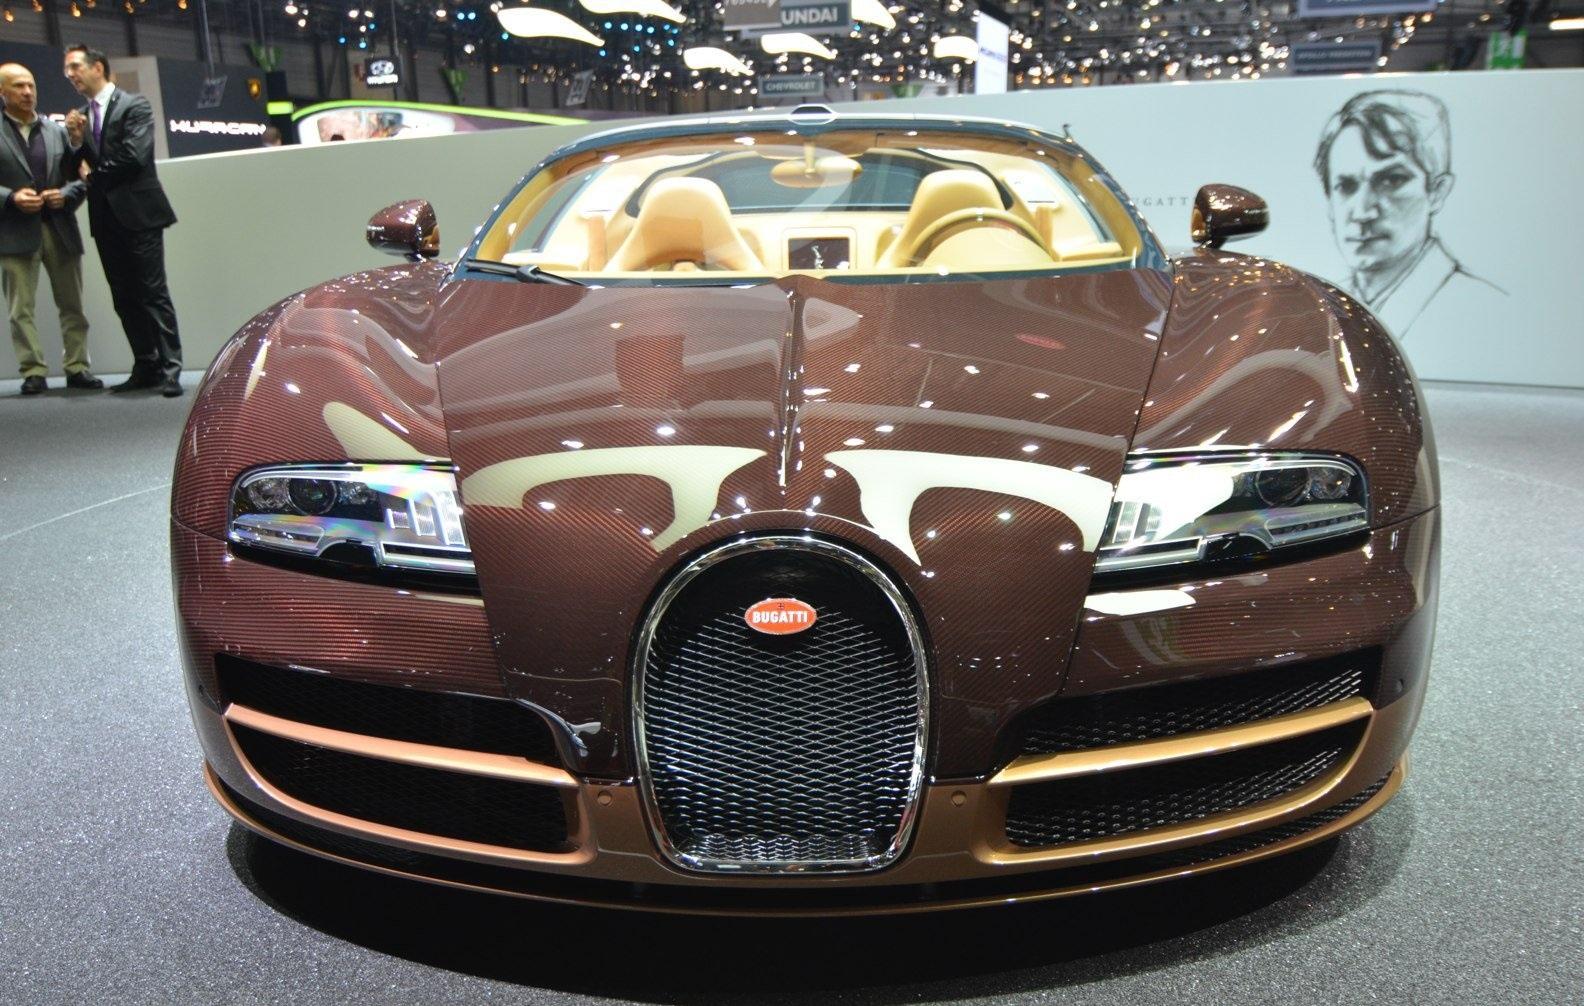 2014-geneva-motor-show-bugatti-veyron-vitesse-rembramdt-bugatti-8